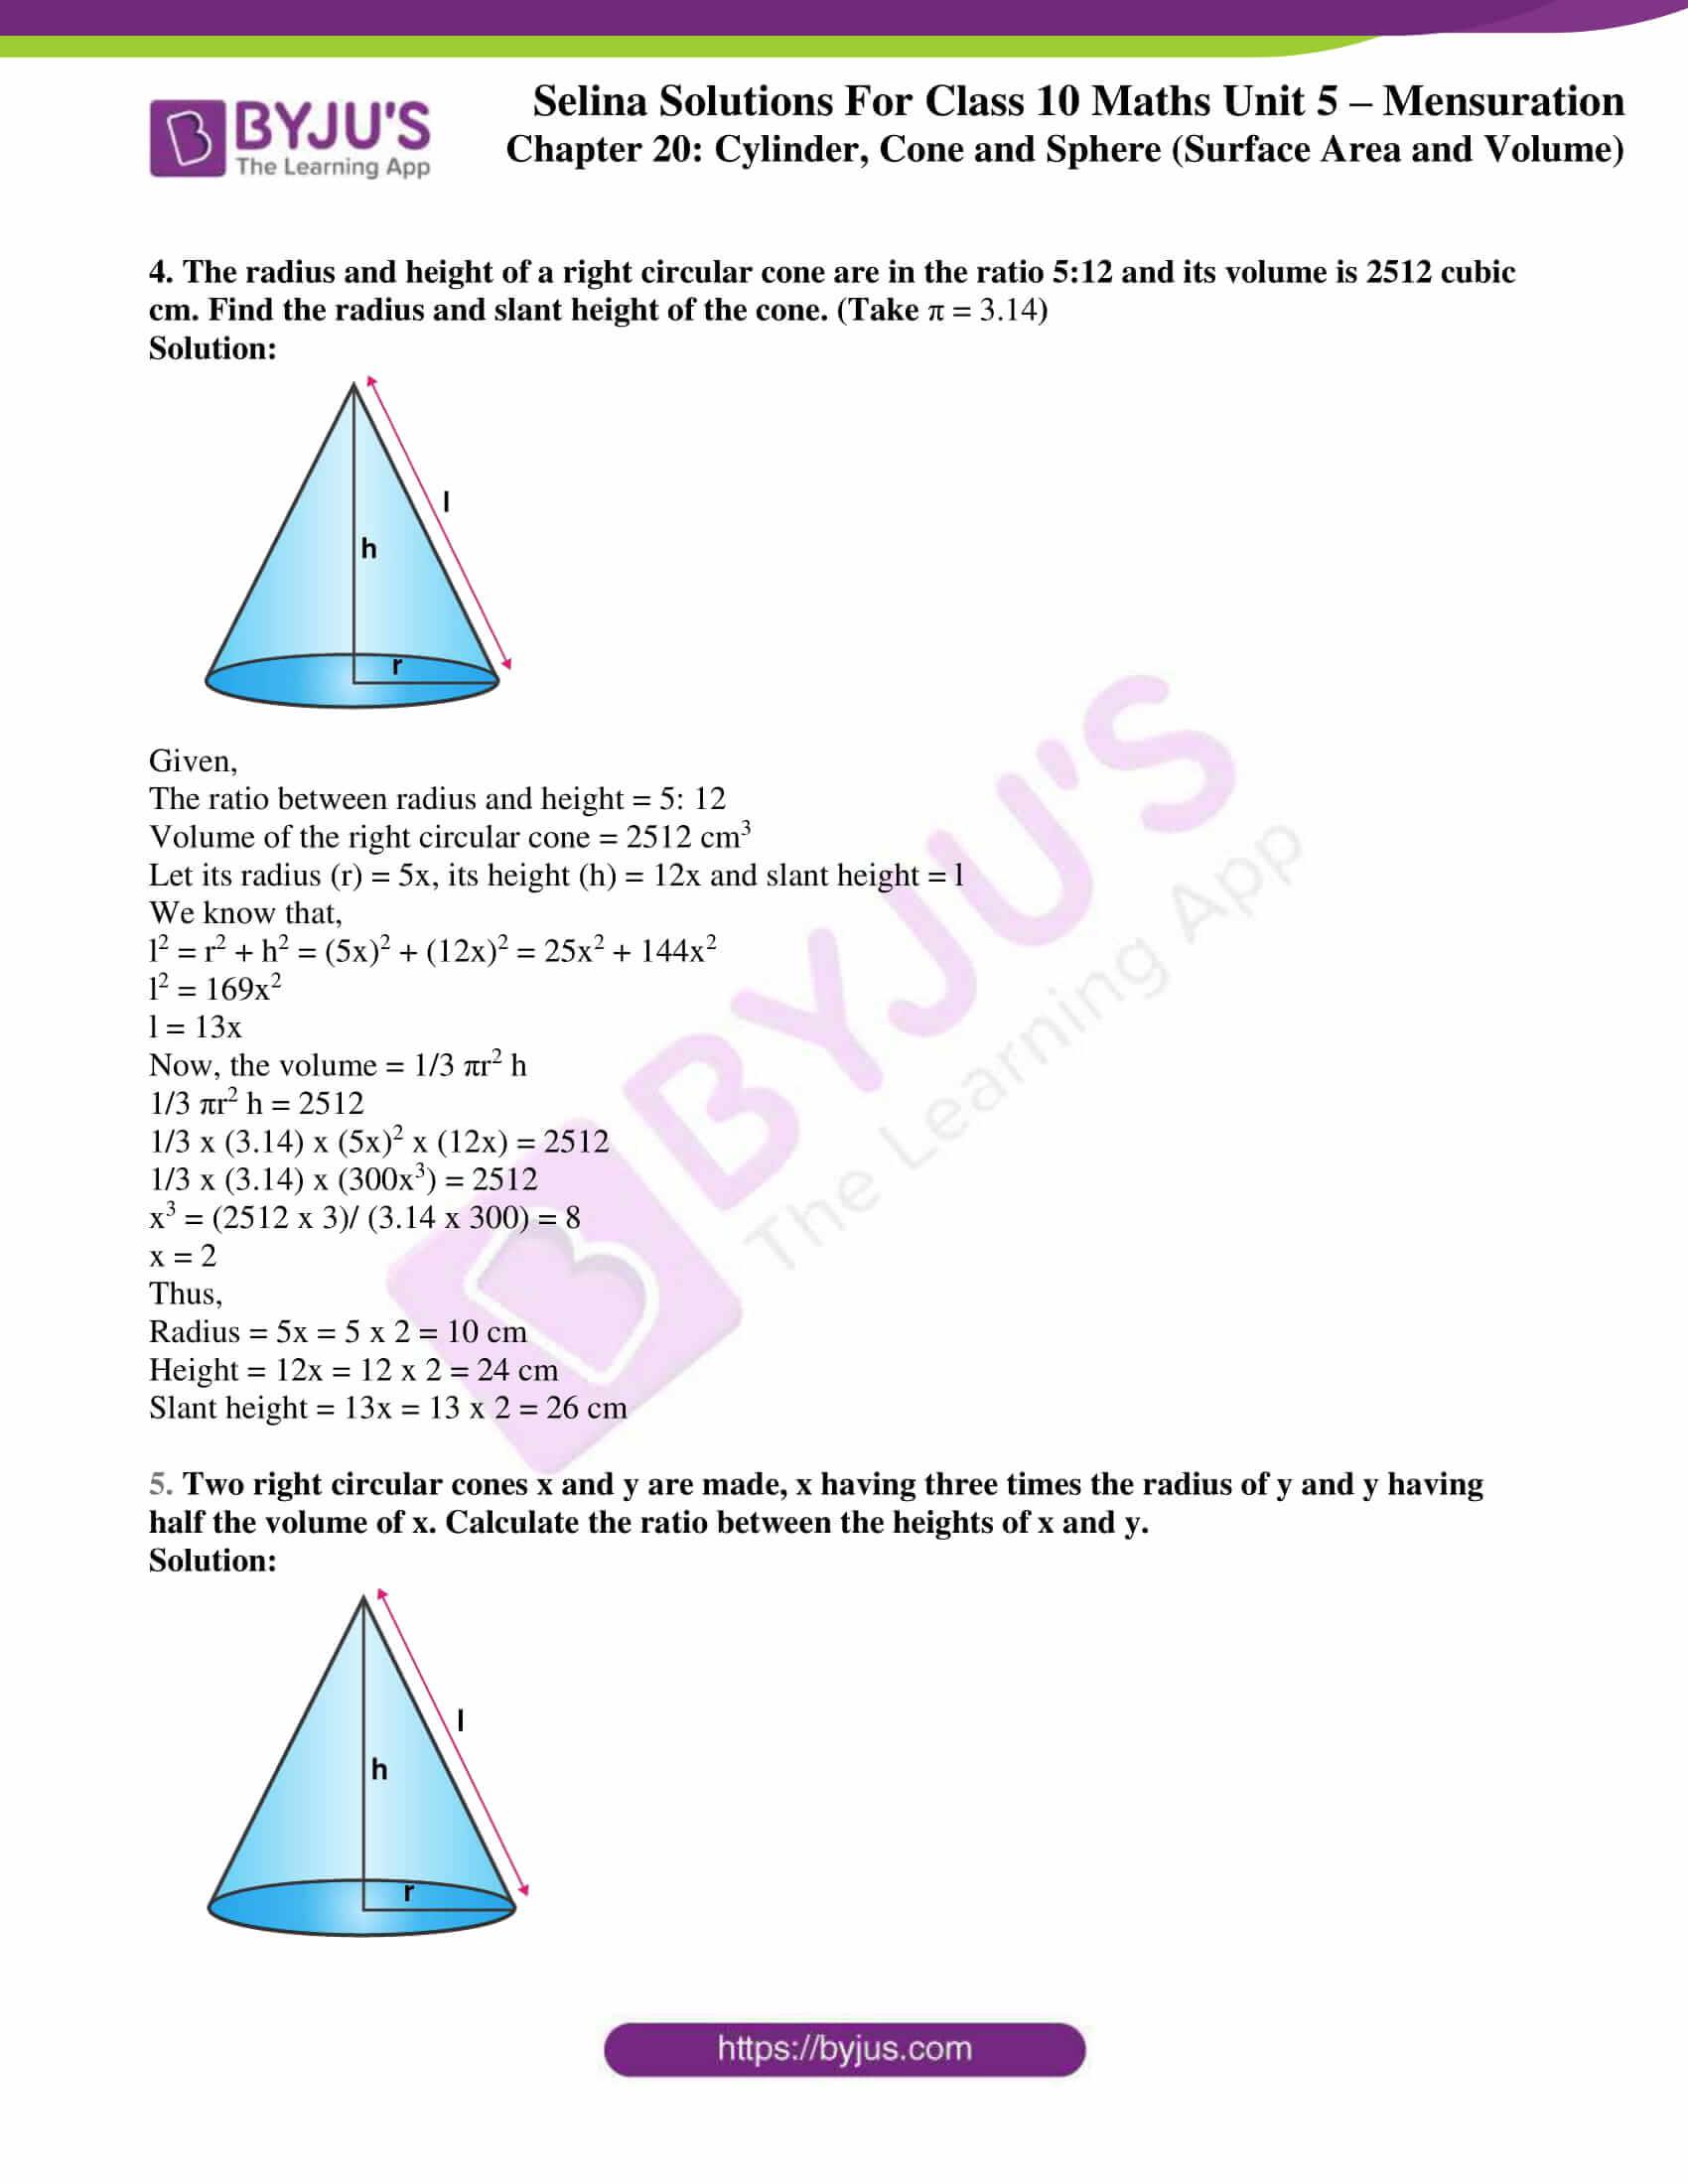 selina-sol-maths-class-10-ch-20-ex-b-2